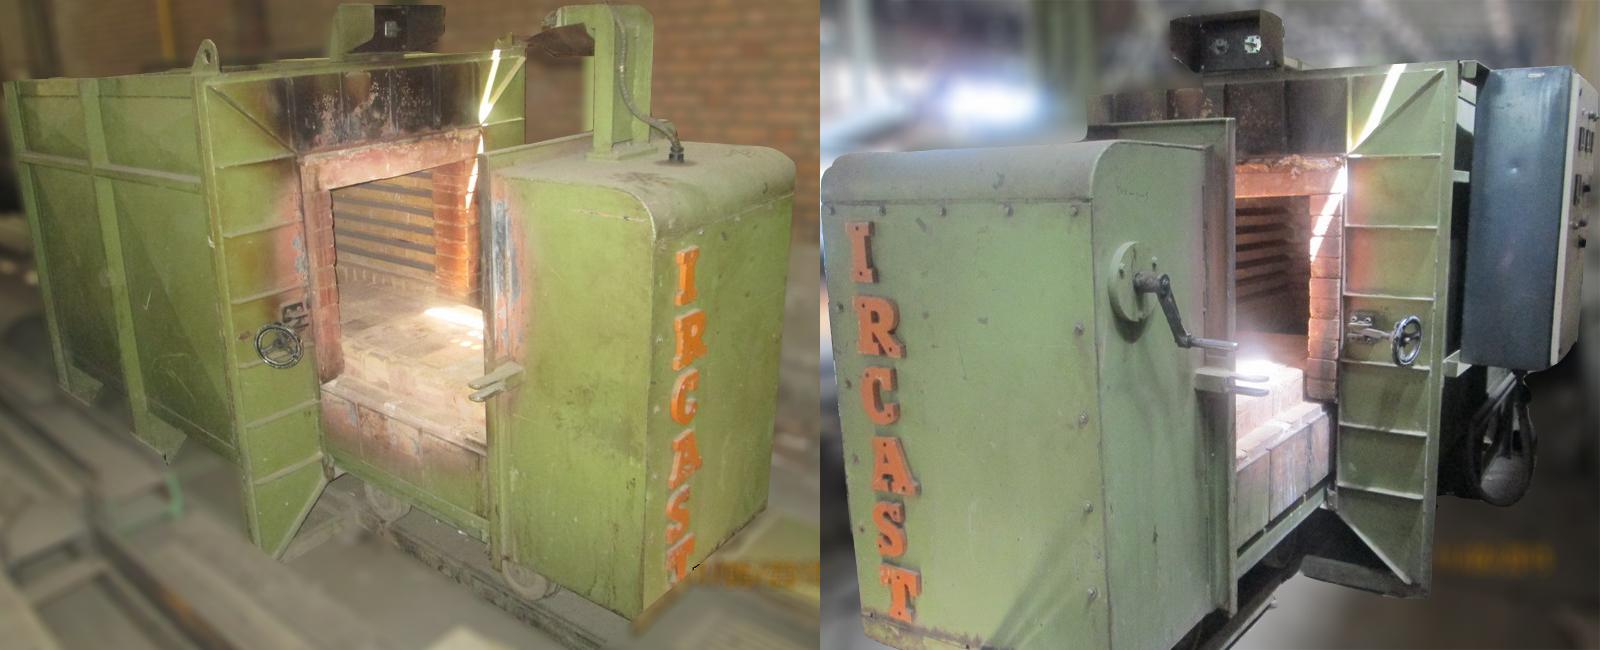 Car bottom heat treatment furnace